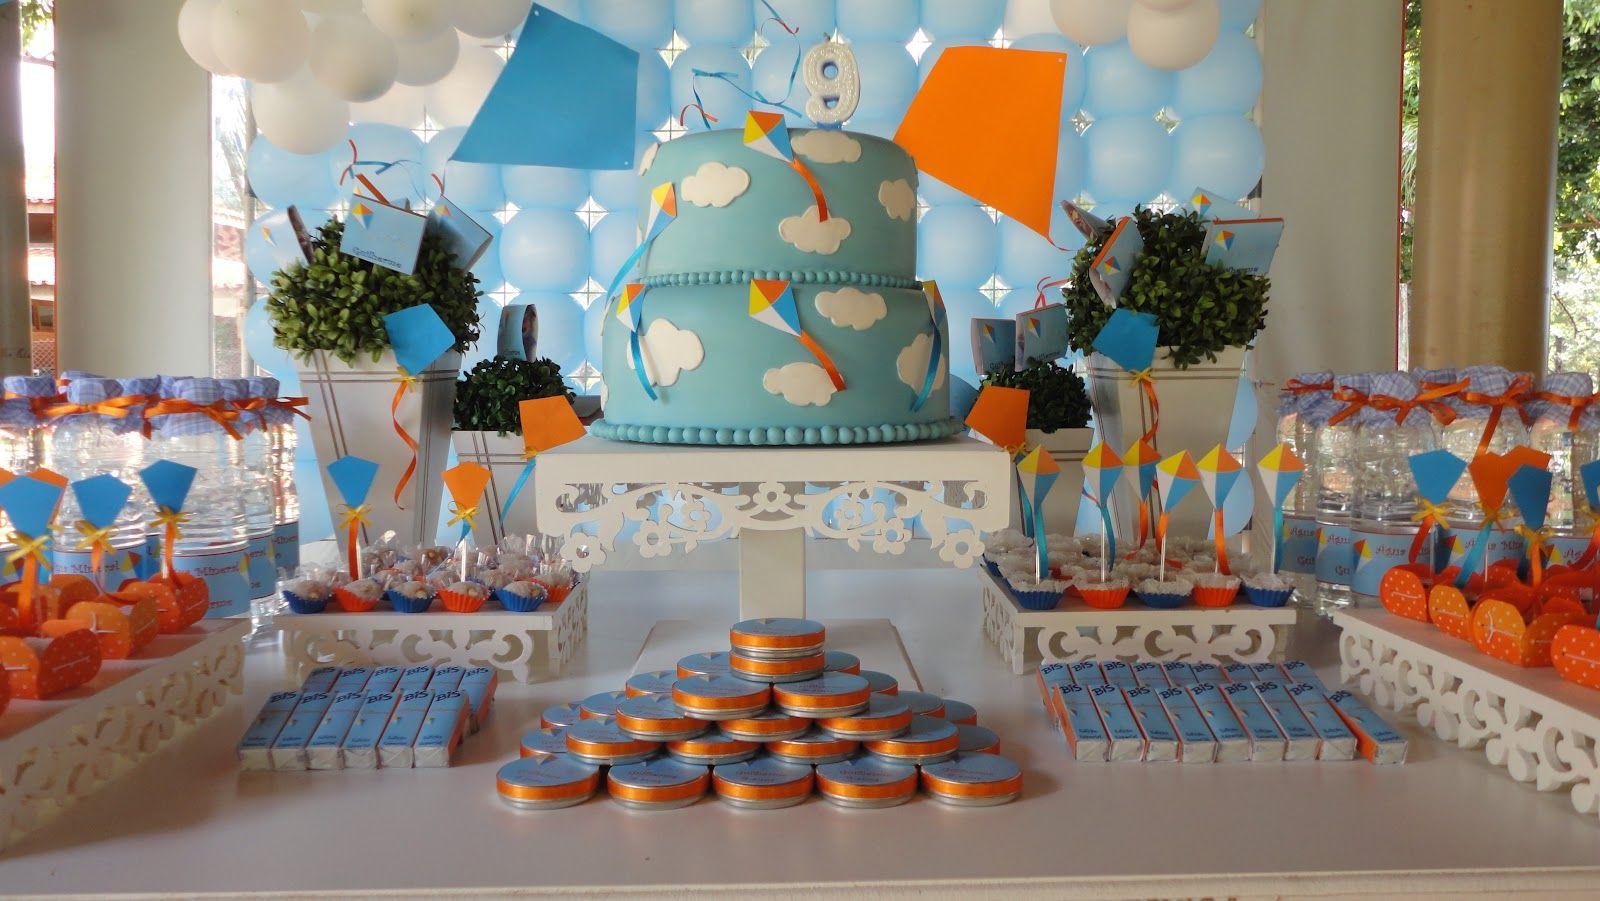 kite decoration | Natalie's 4th birthday | Kite party ...